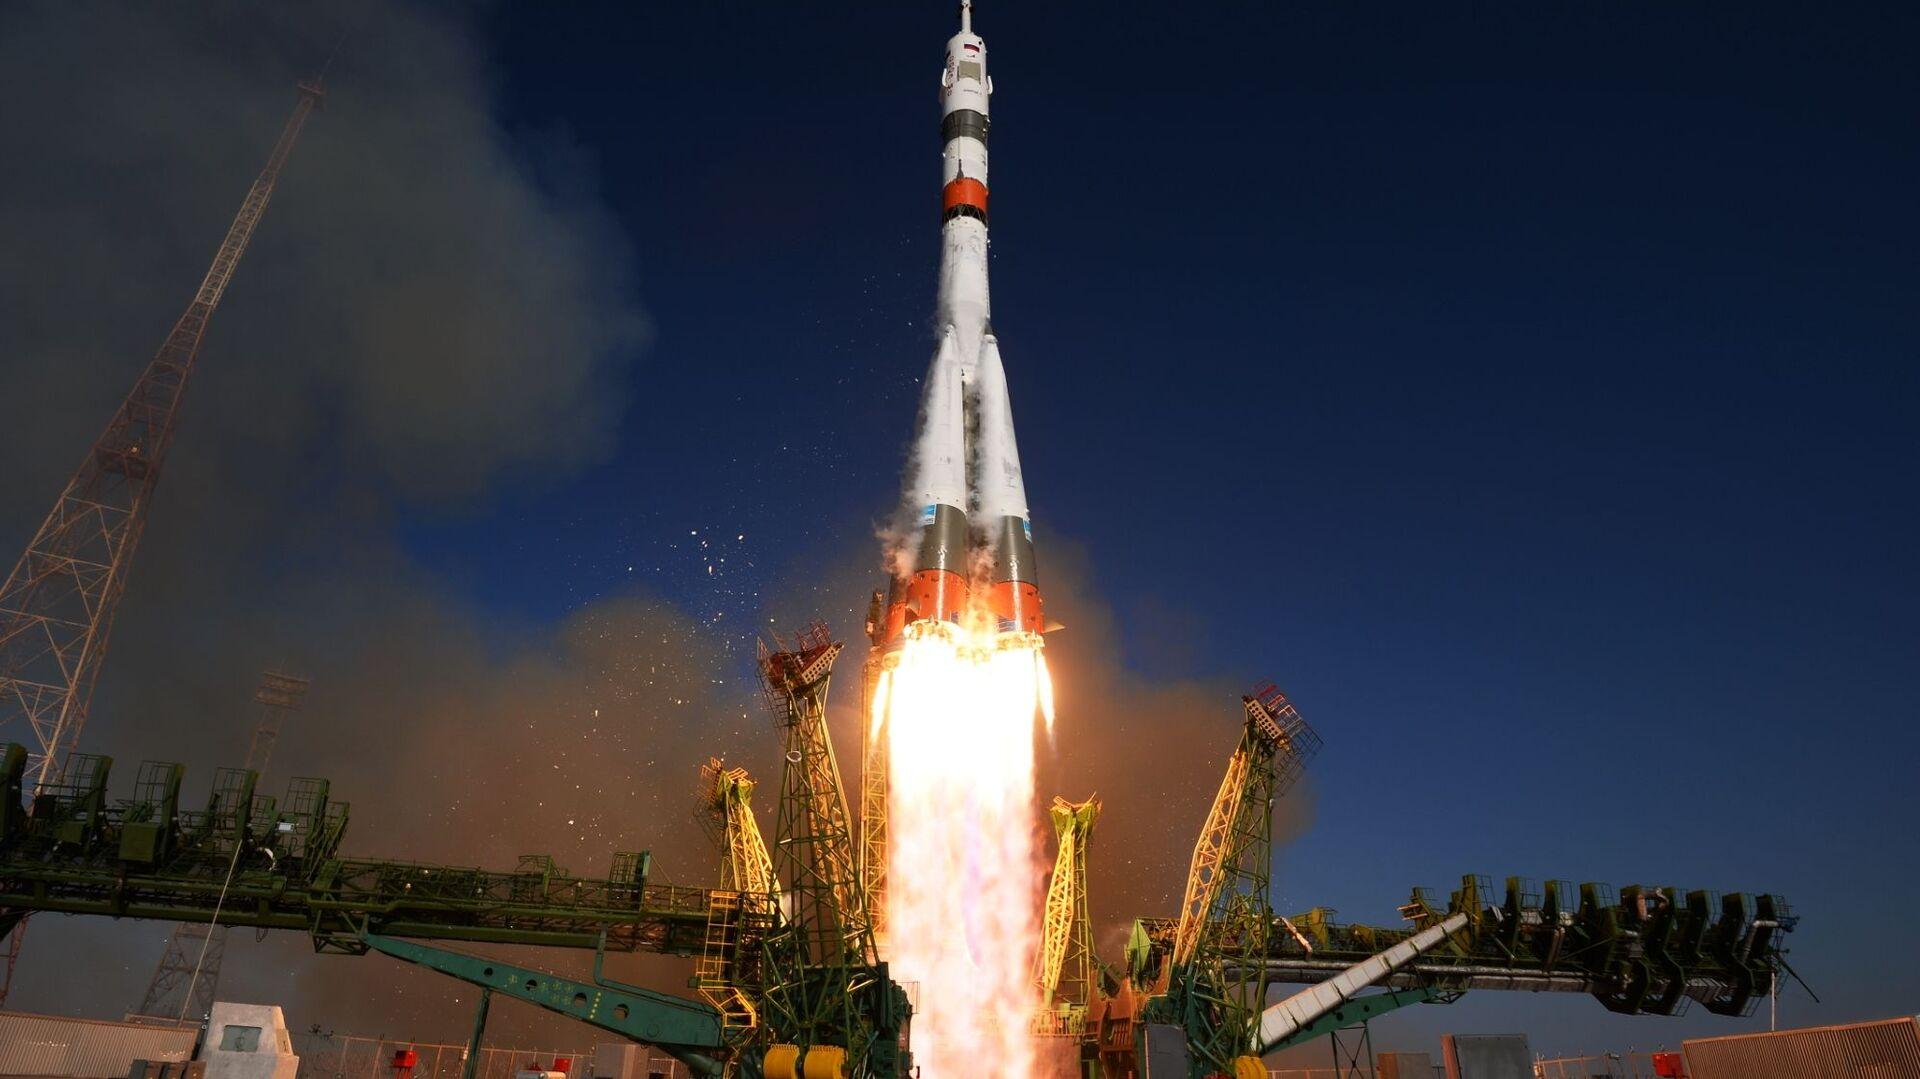 Start rakety z kosmodromu Bajkonur - Sputnik Česká republika, 1920, 28.03.2020